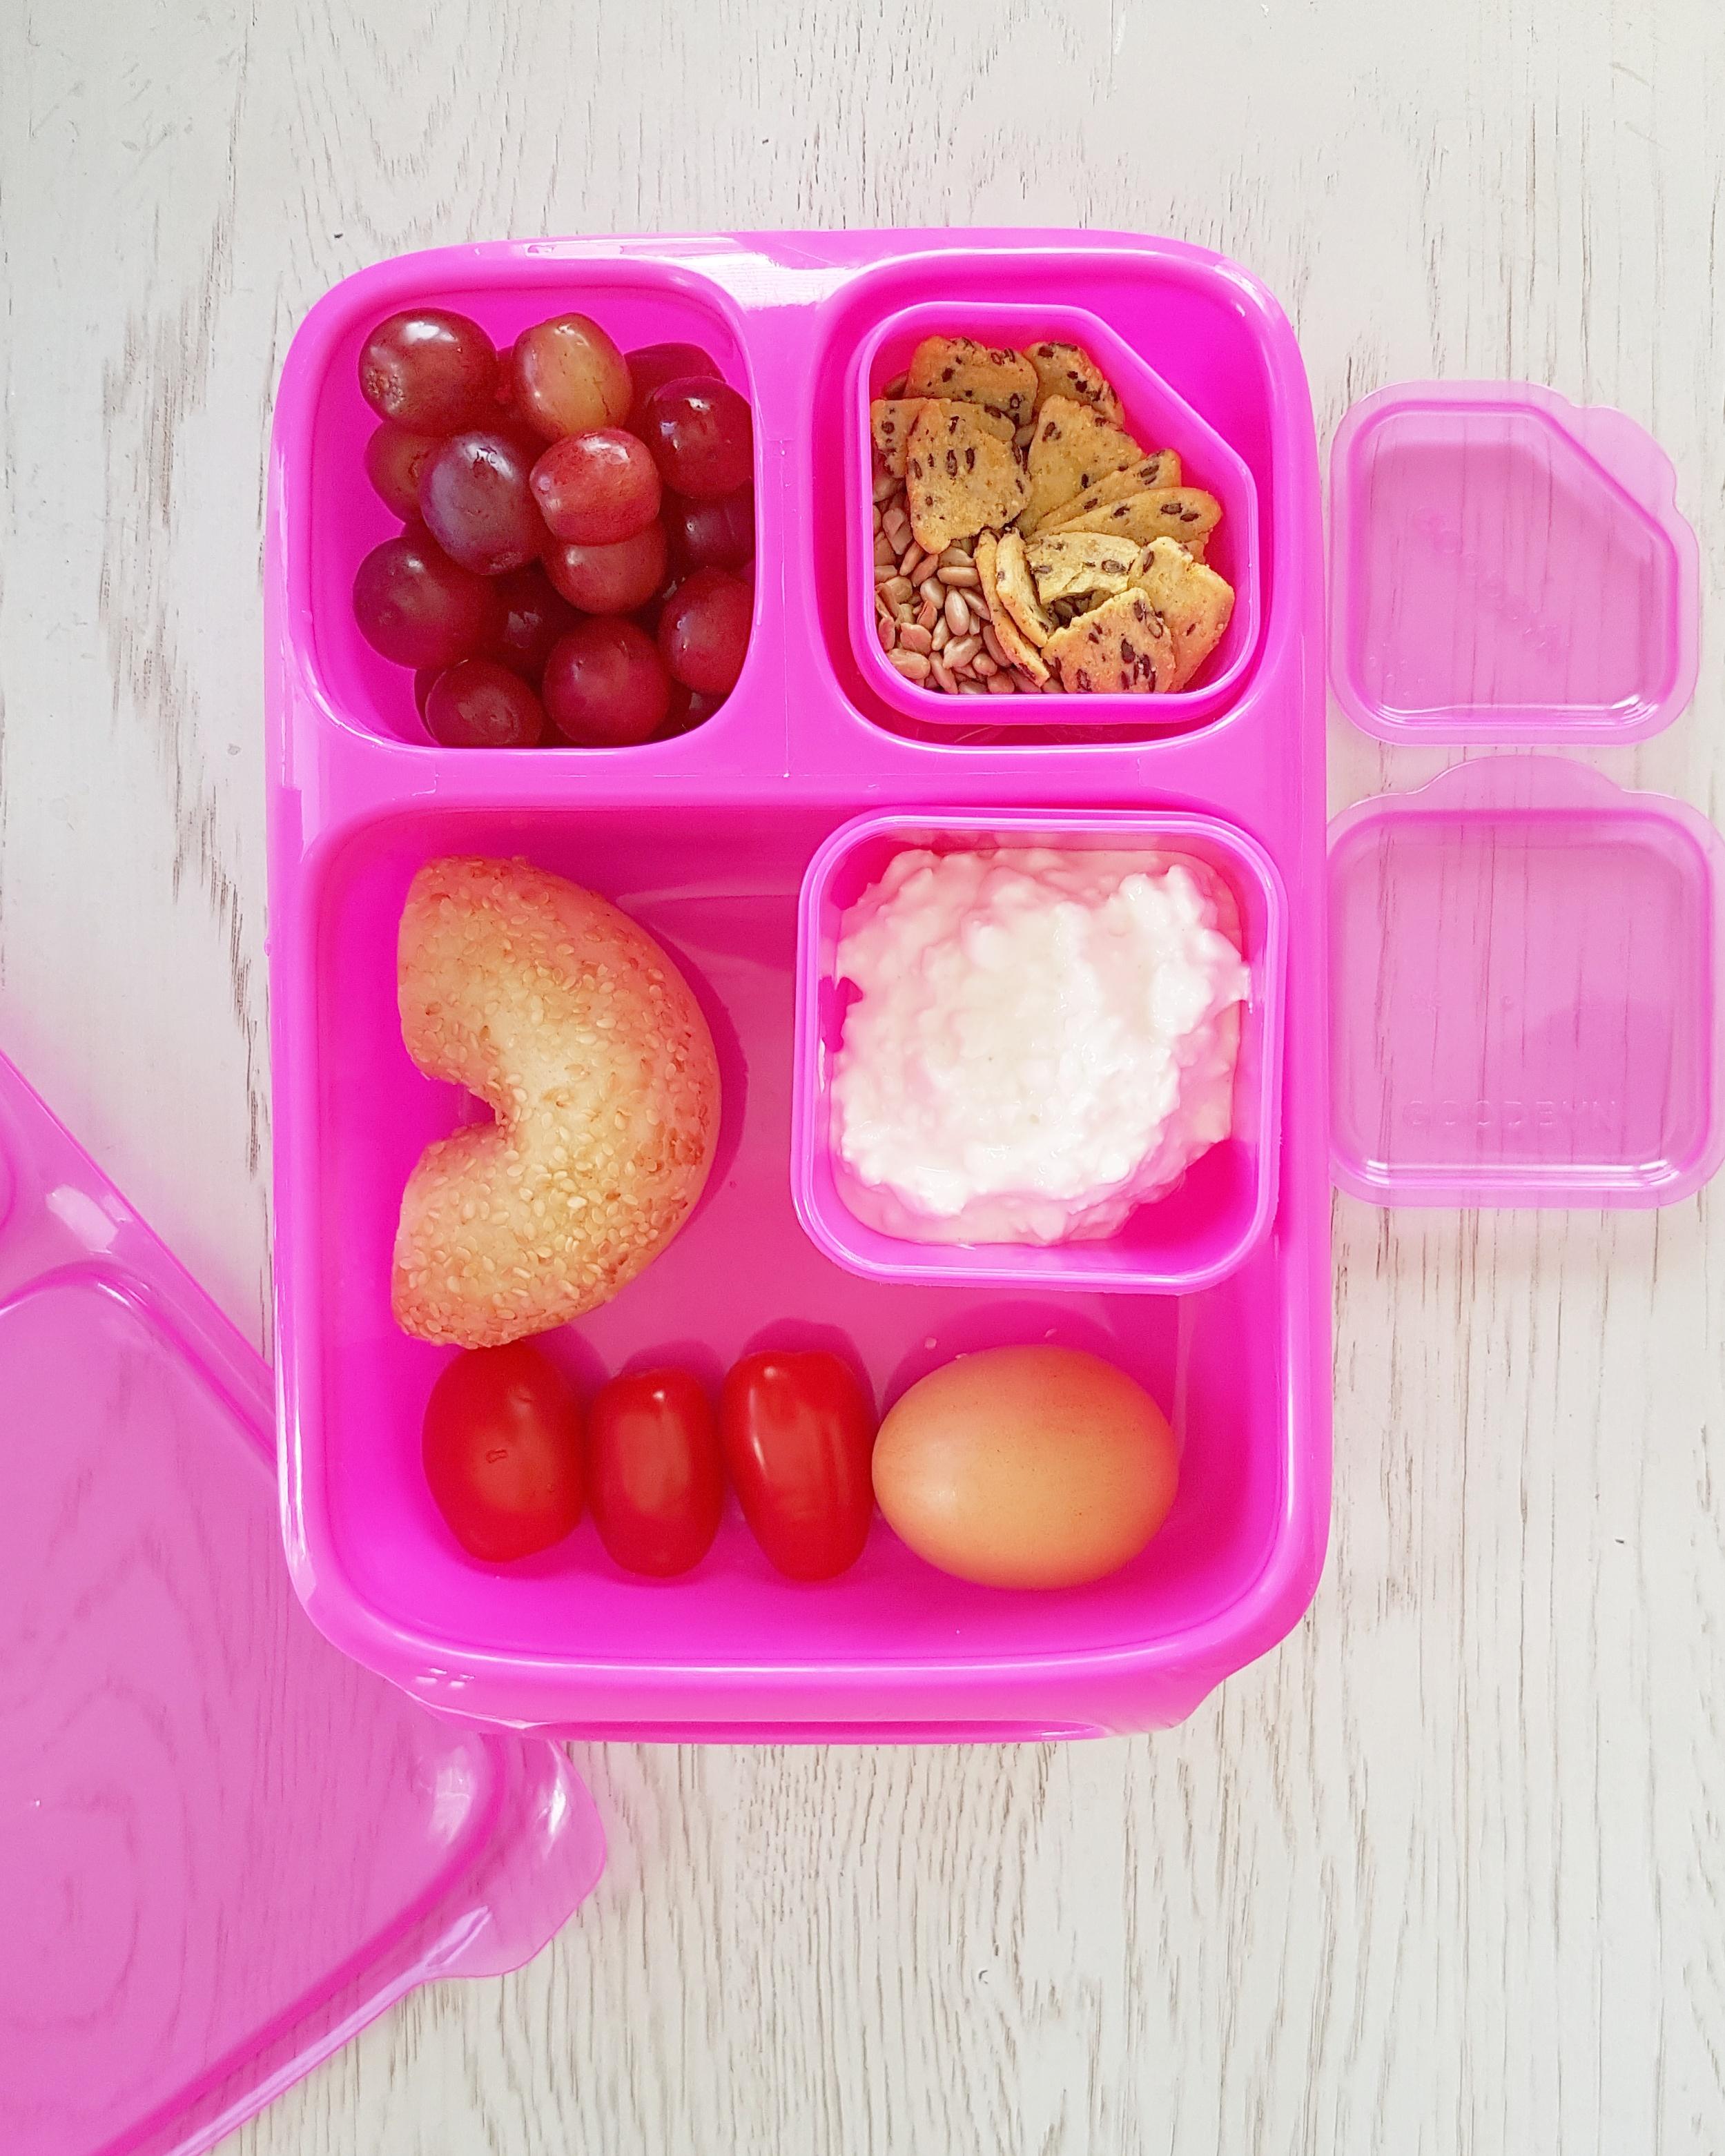 vegetaran lunch ideas for kids in goodbyn.jpg